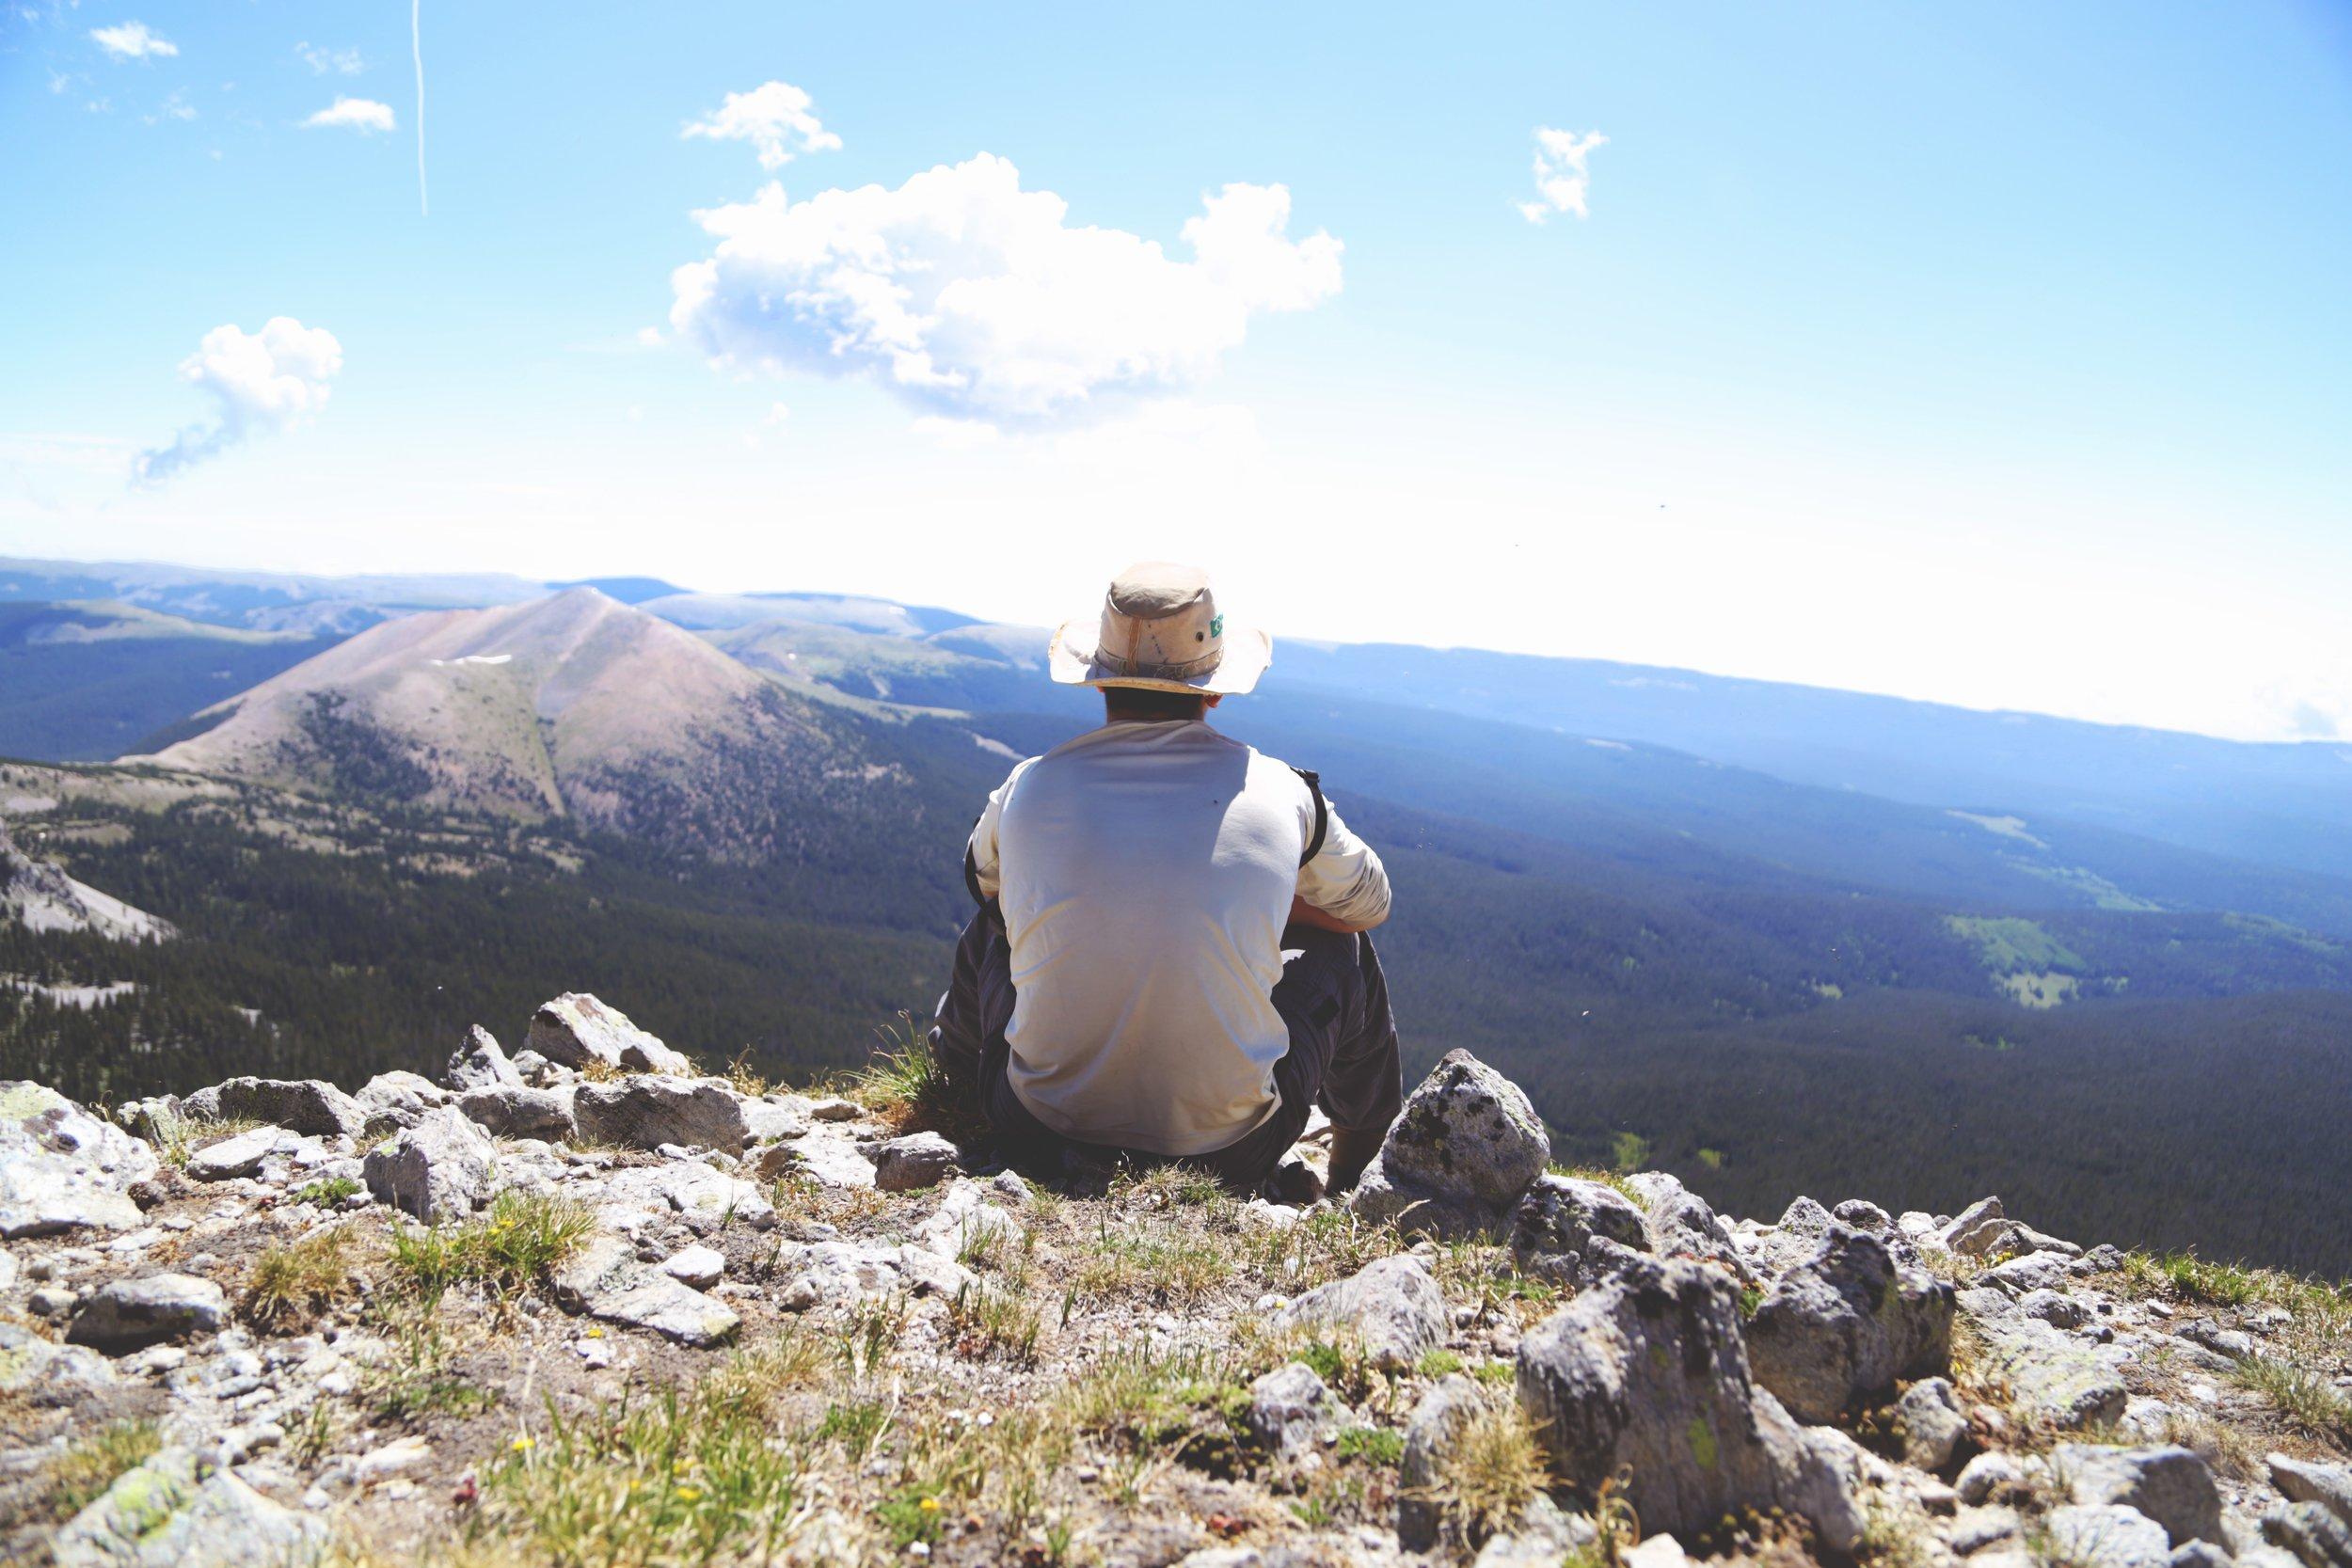 man sitting on mountain summit looking at landscape